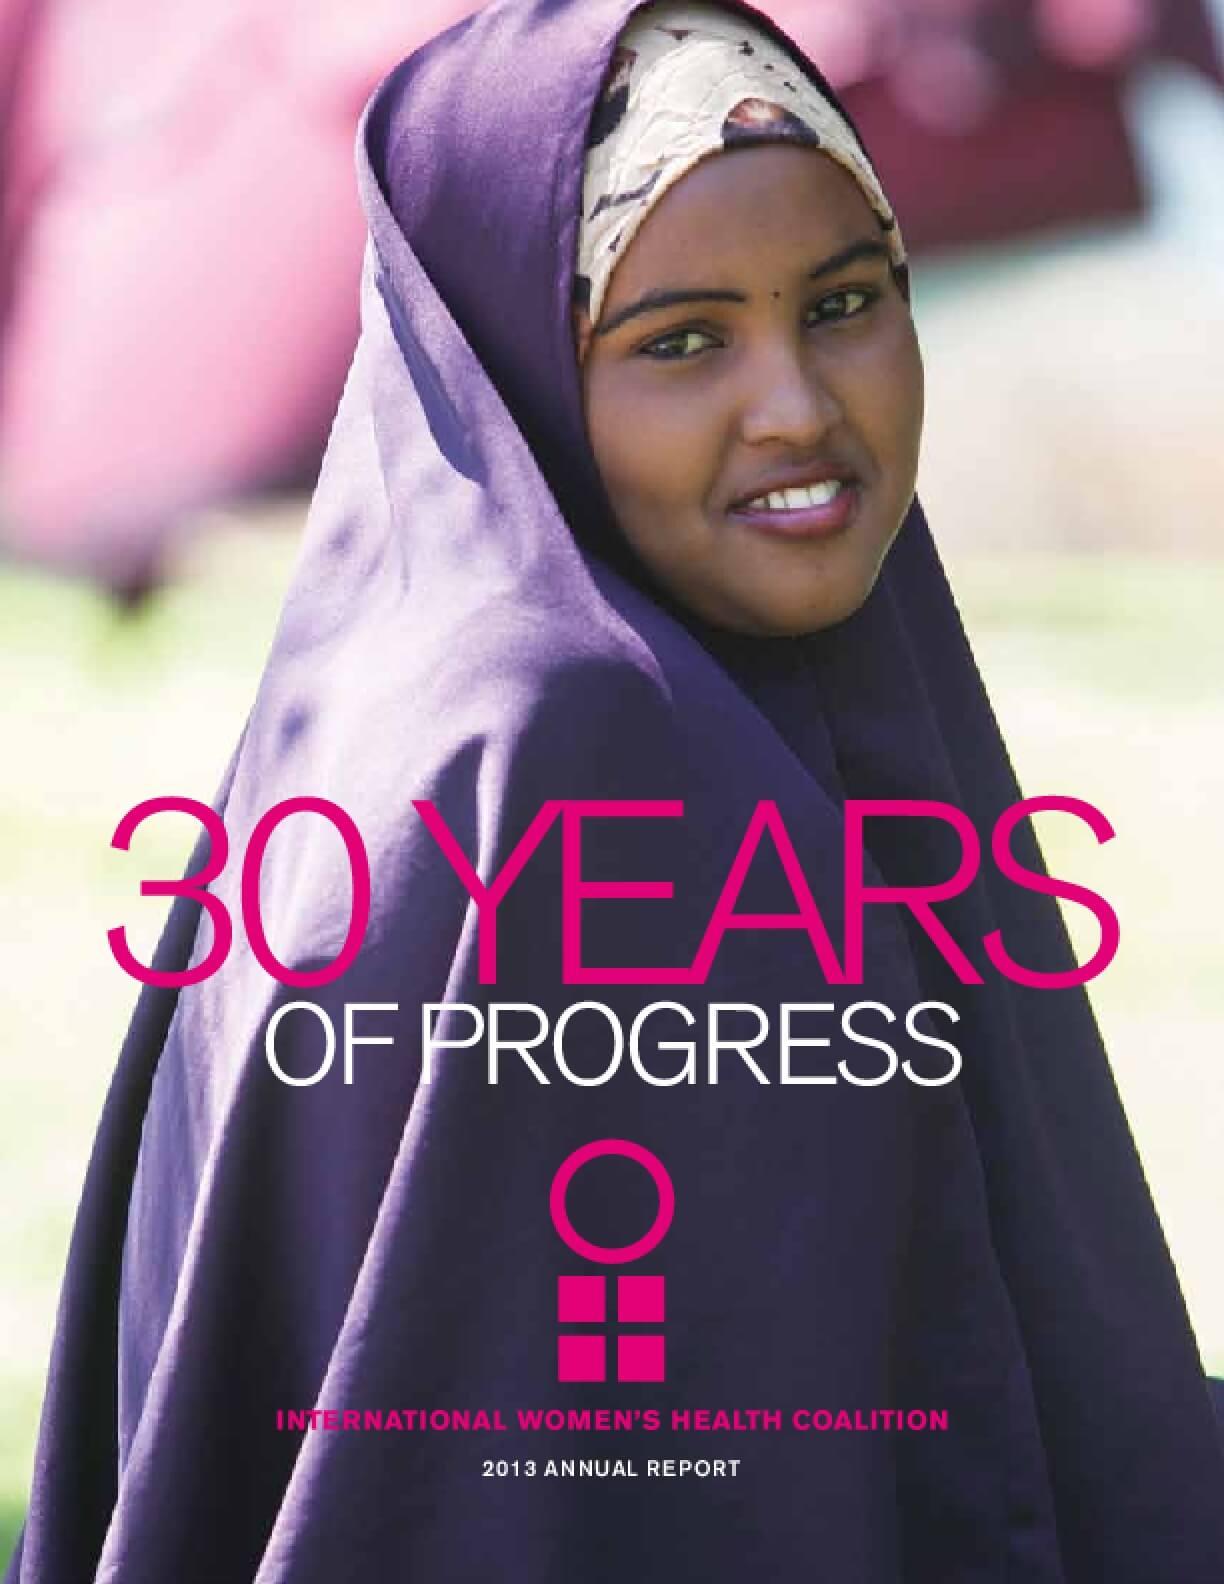 International Women's Health Coalition 2013 Annual Report